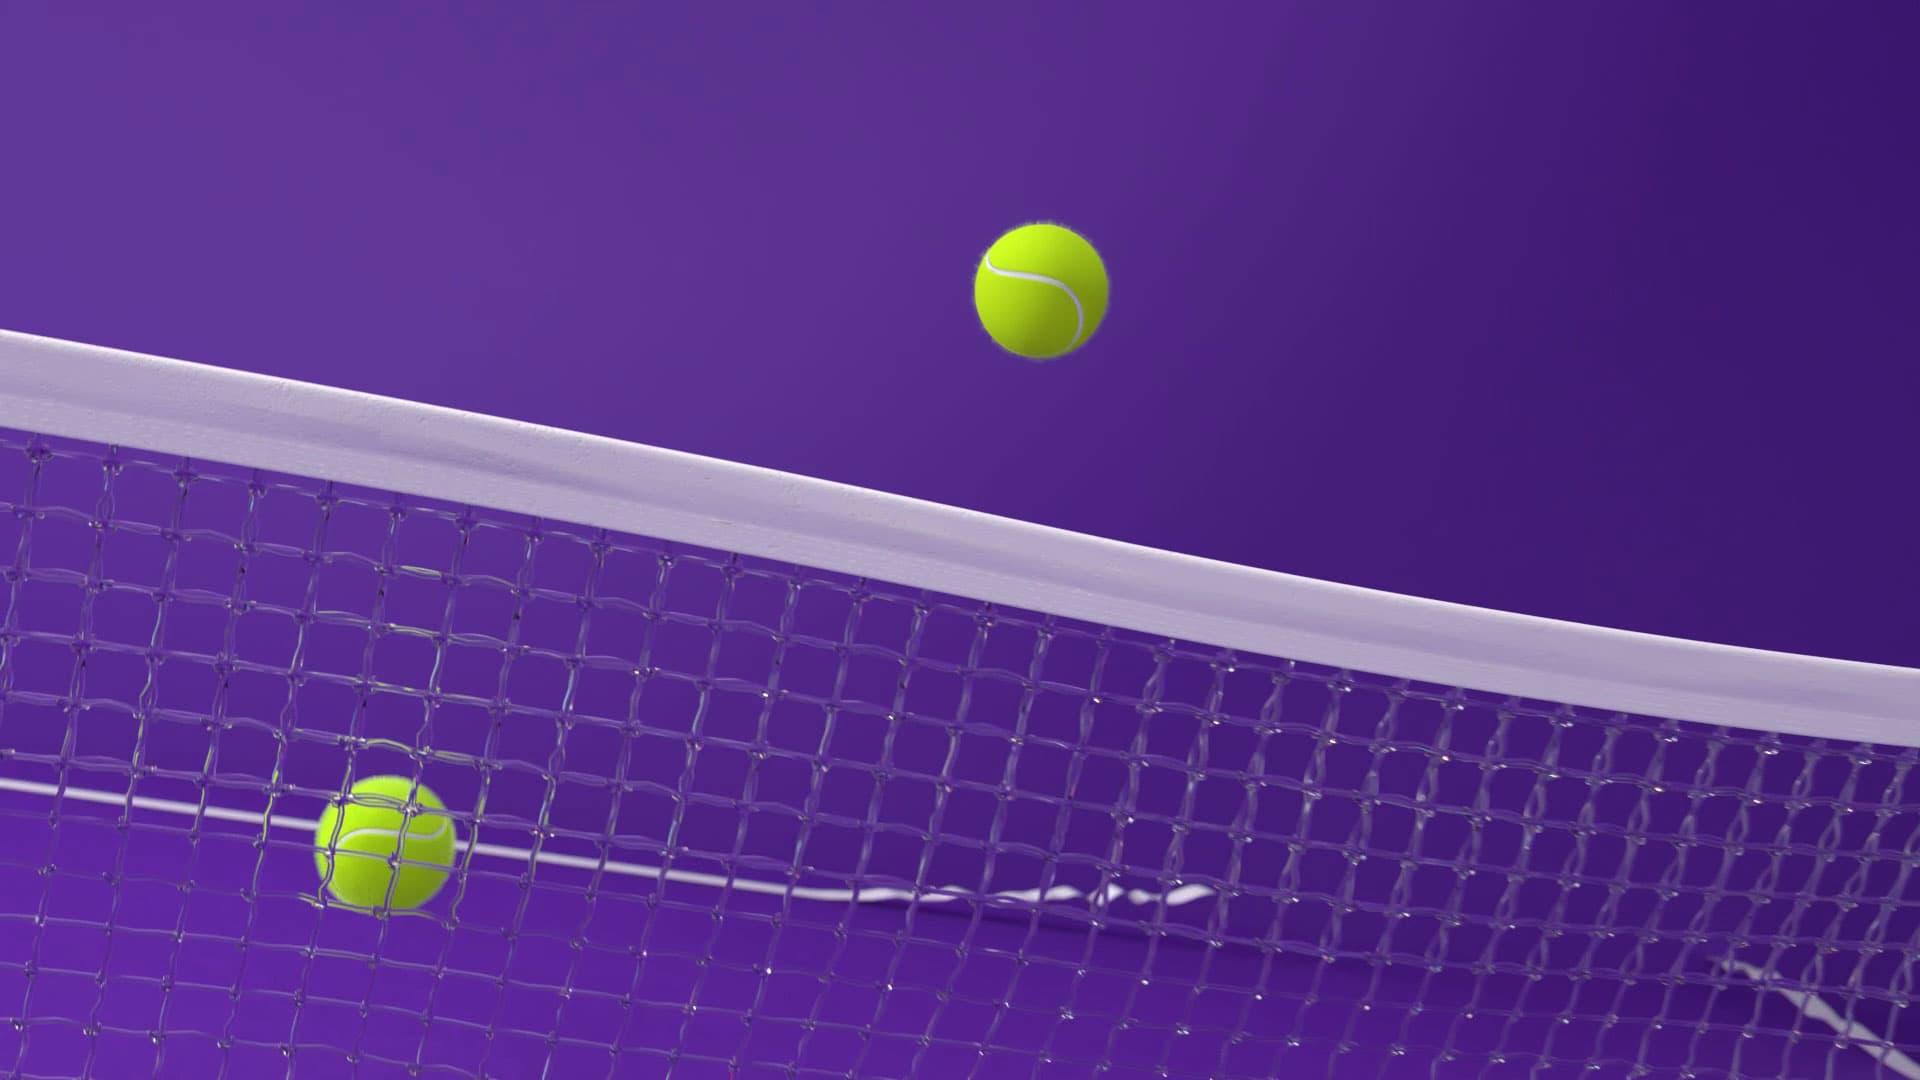 2020 WTA Opener Stills 08 Girraphic